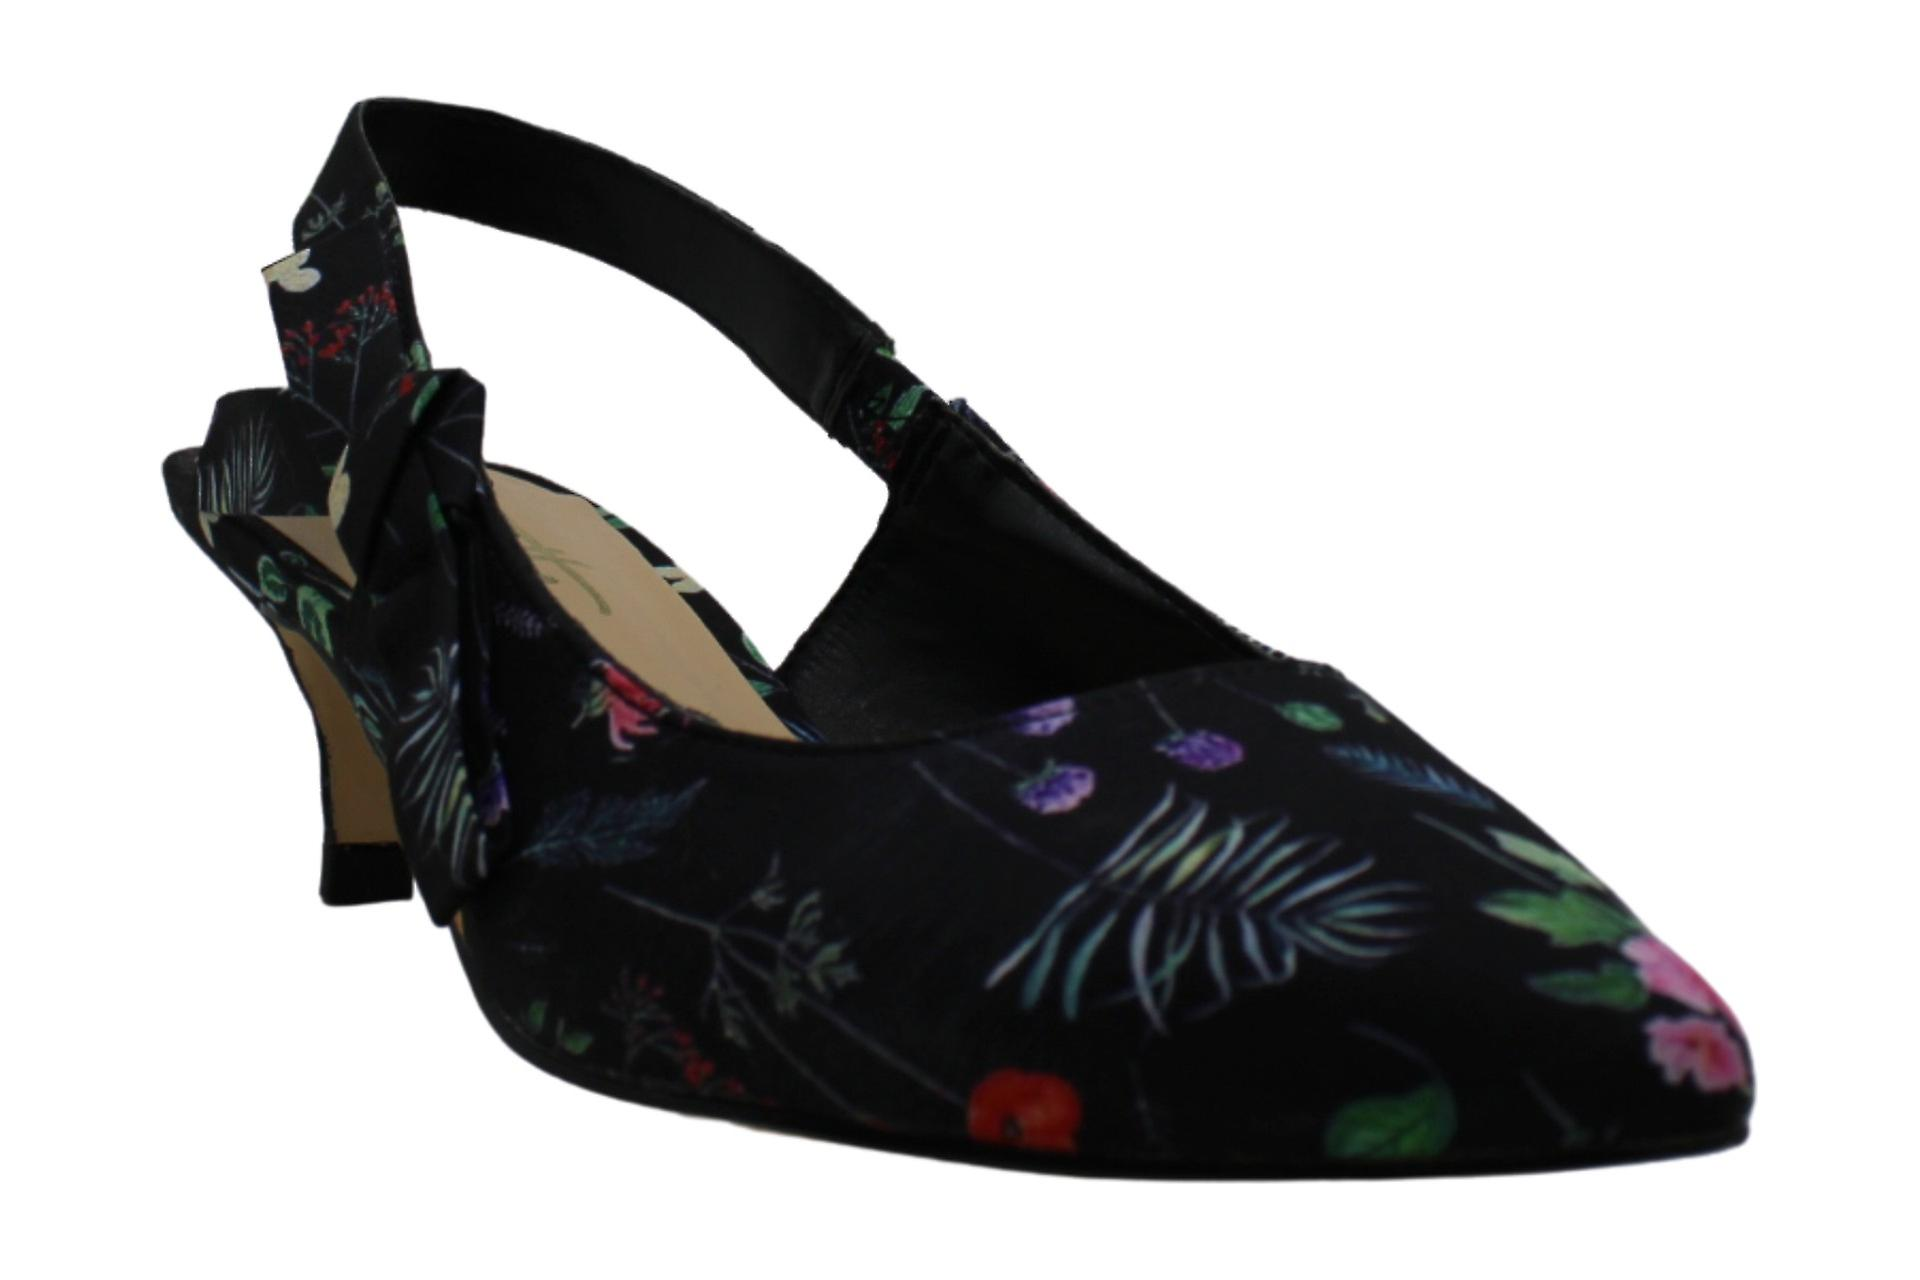 Nanette Lepore Womens Rhona Fabric Pointed Toe SlingBack D-orsay Pumps